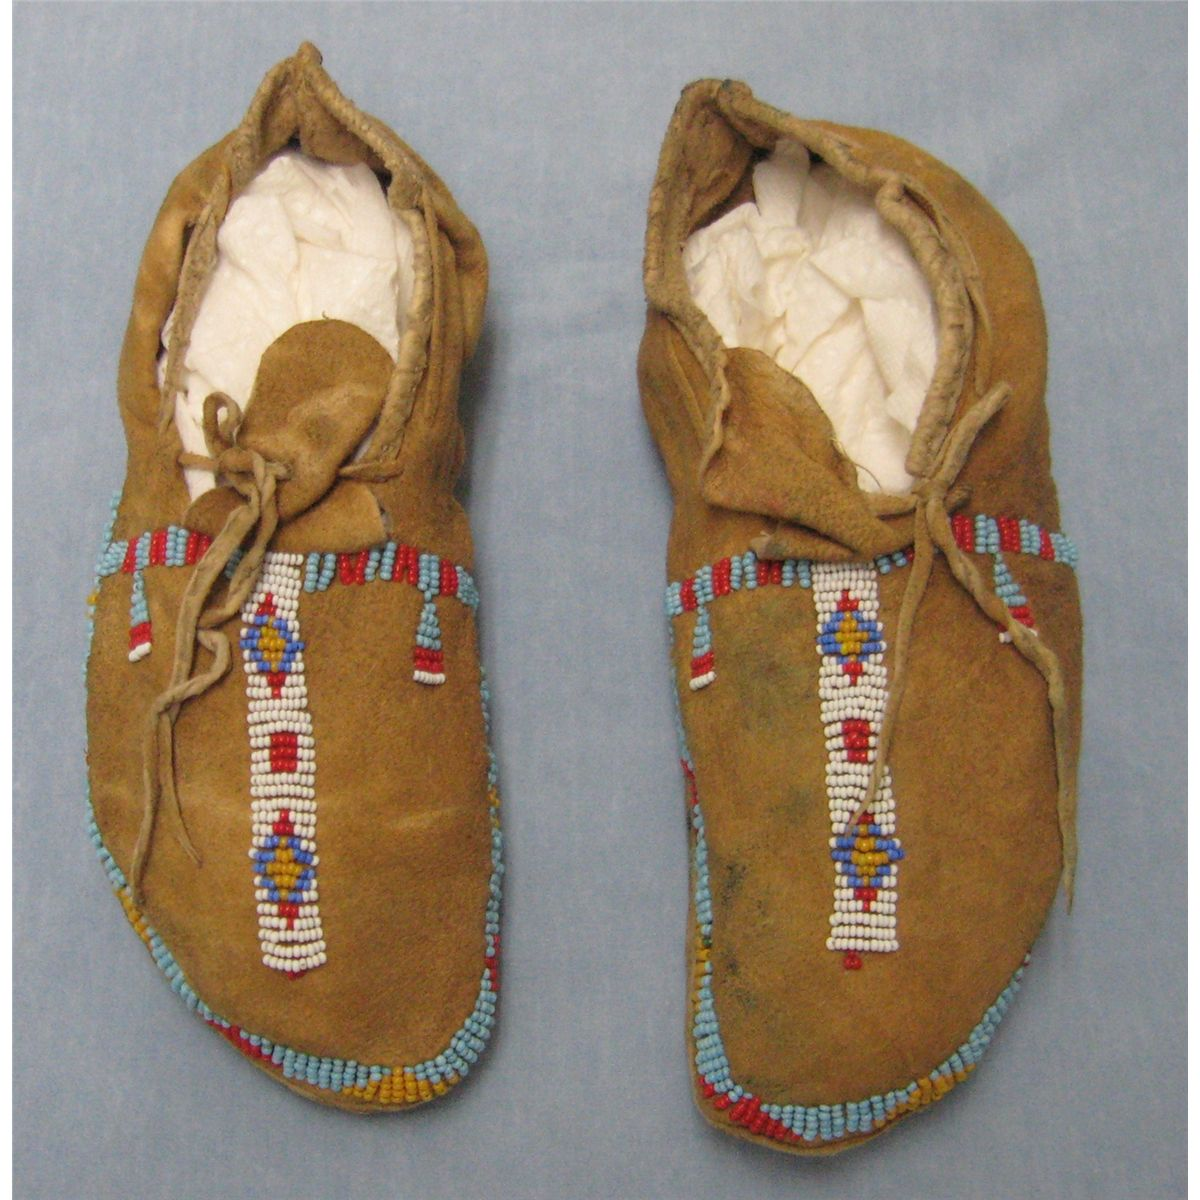 b596e29e3 Beaded moccasins, Plains Indian Est. $300-600. Loading zoom